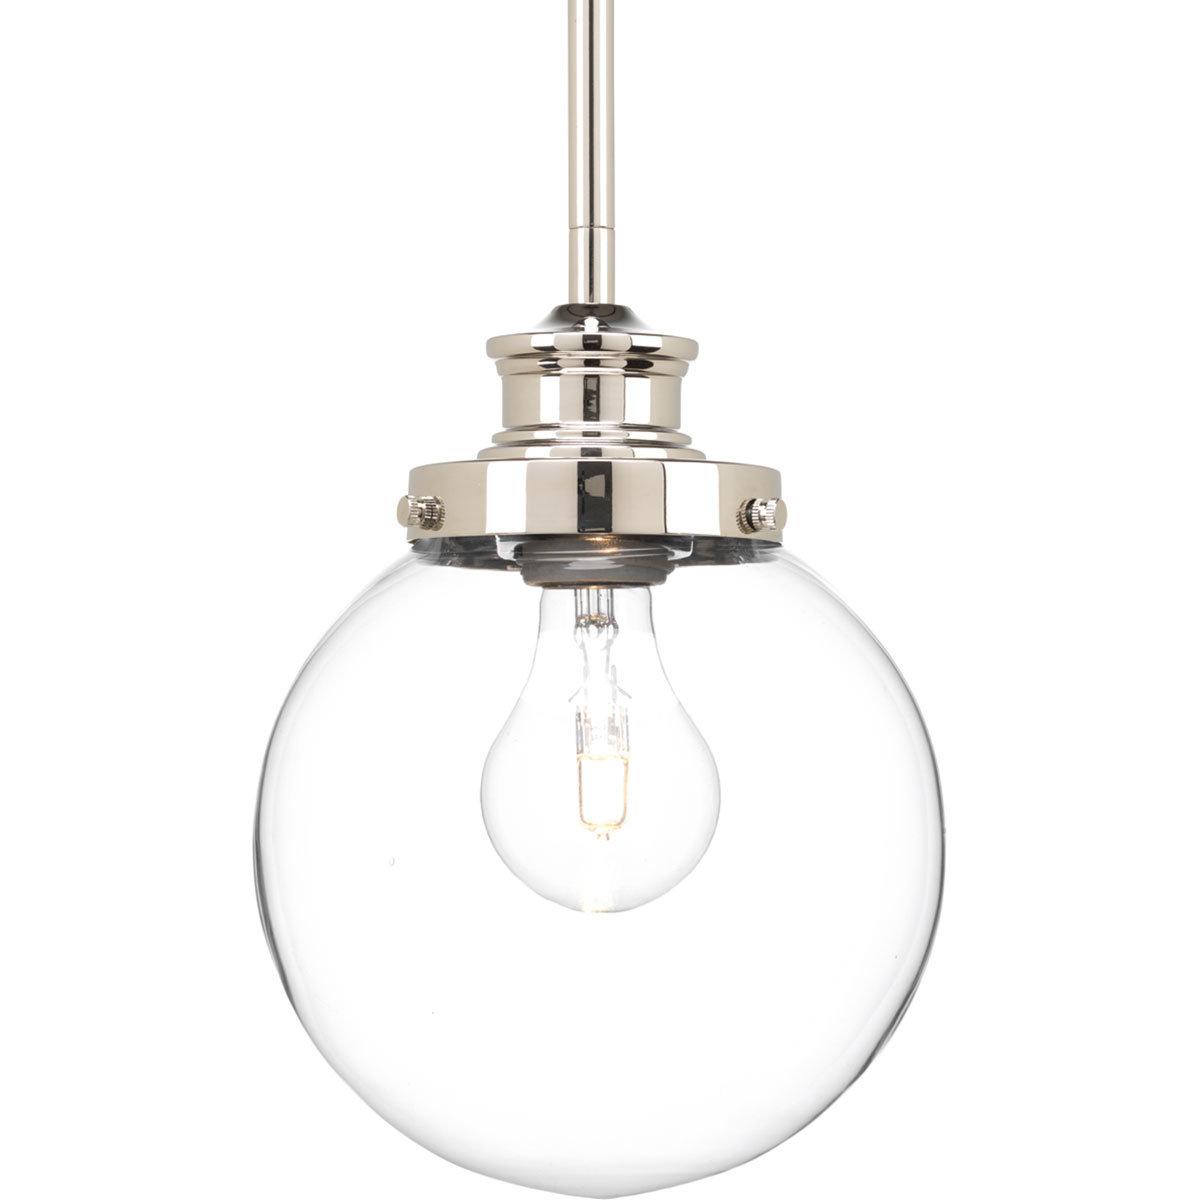 2019 Cayden 1 Light Single Globe Pendant With Cayden 1 Light Single Globe Pendants (View 1 of 25)